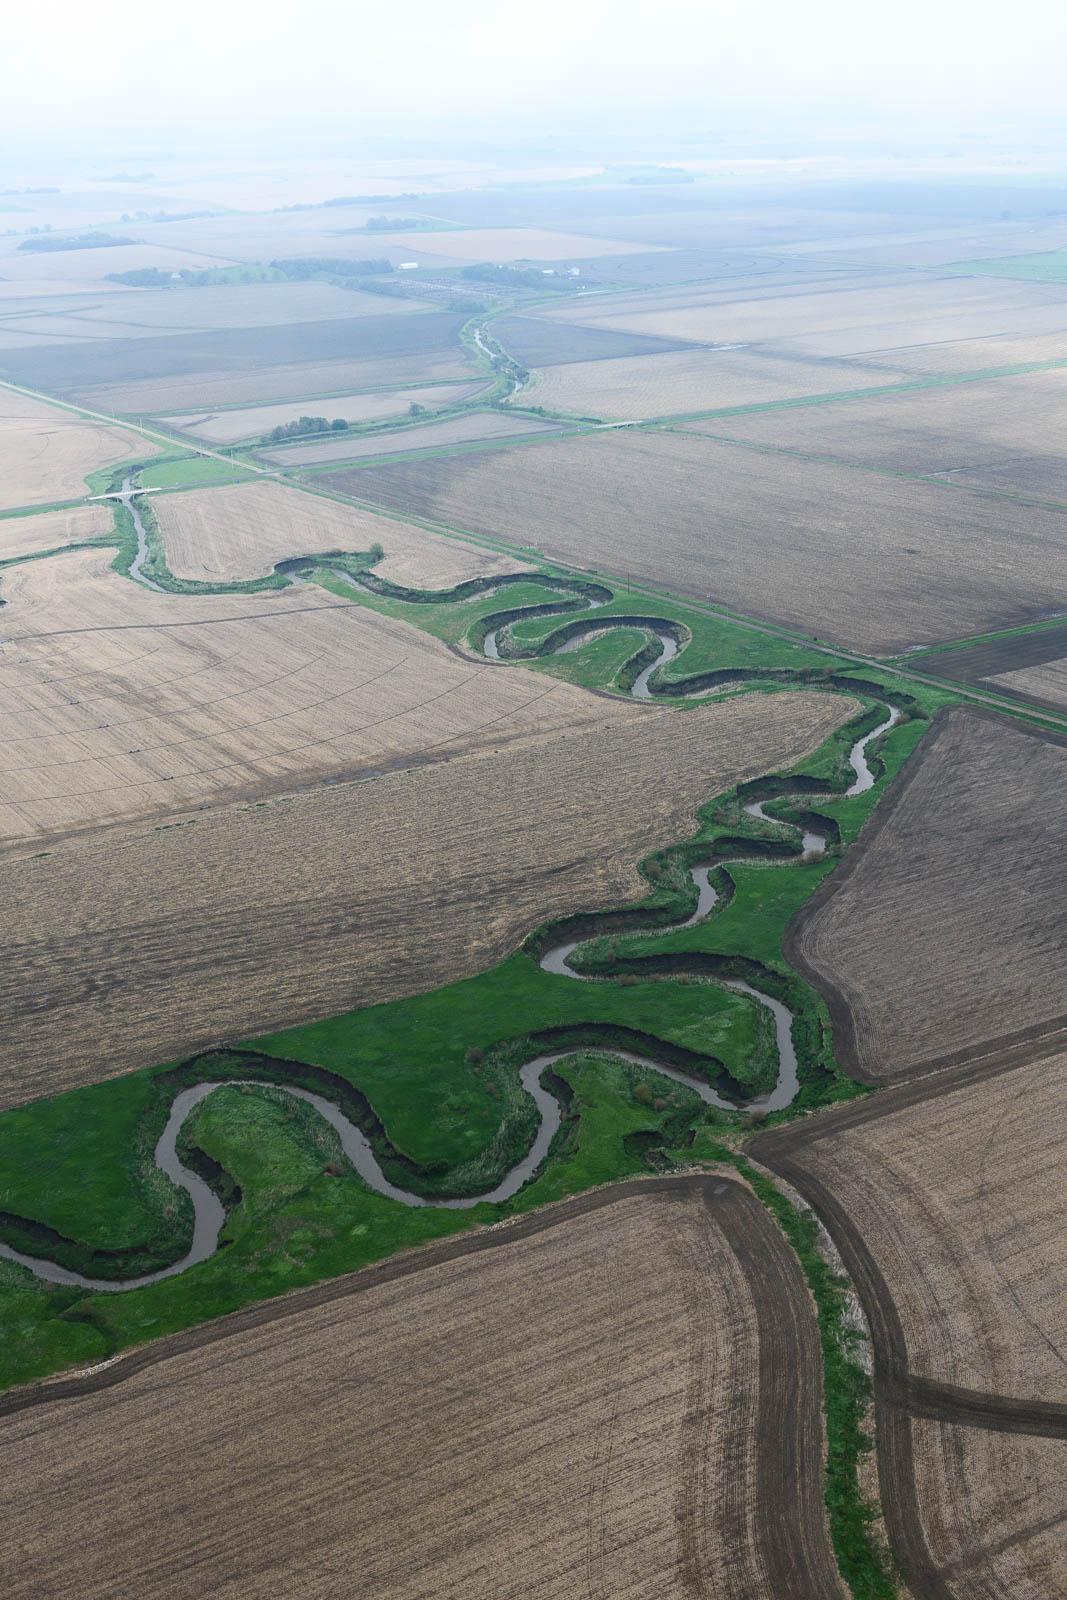 Meandering rivers of Wisner, Nebraska